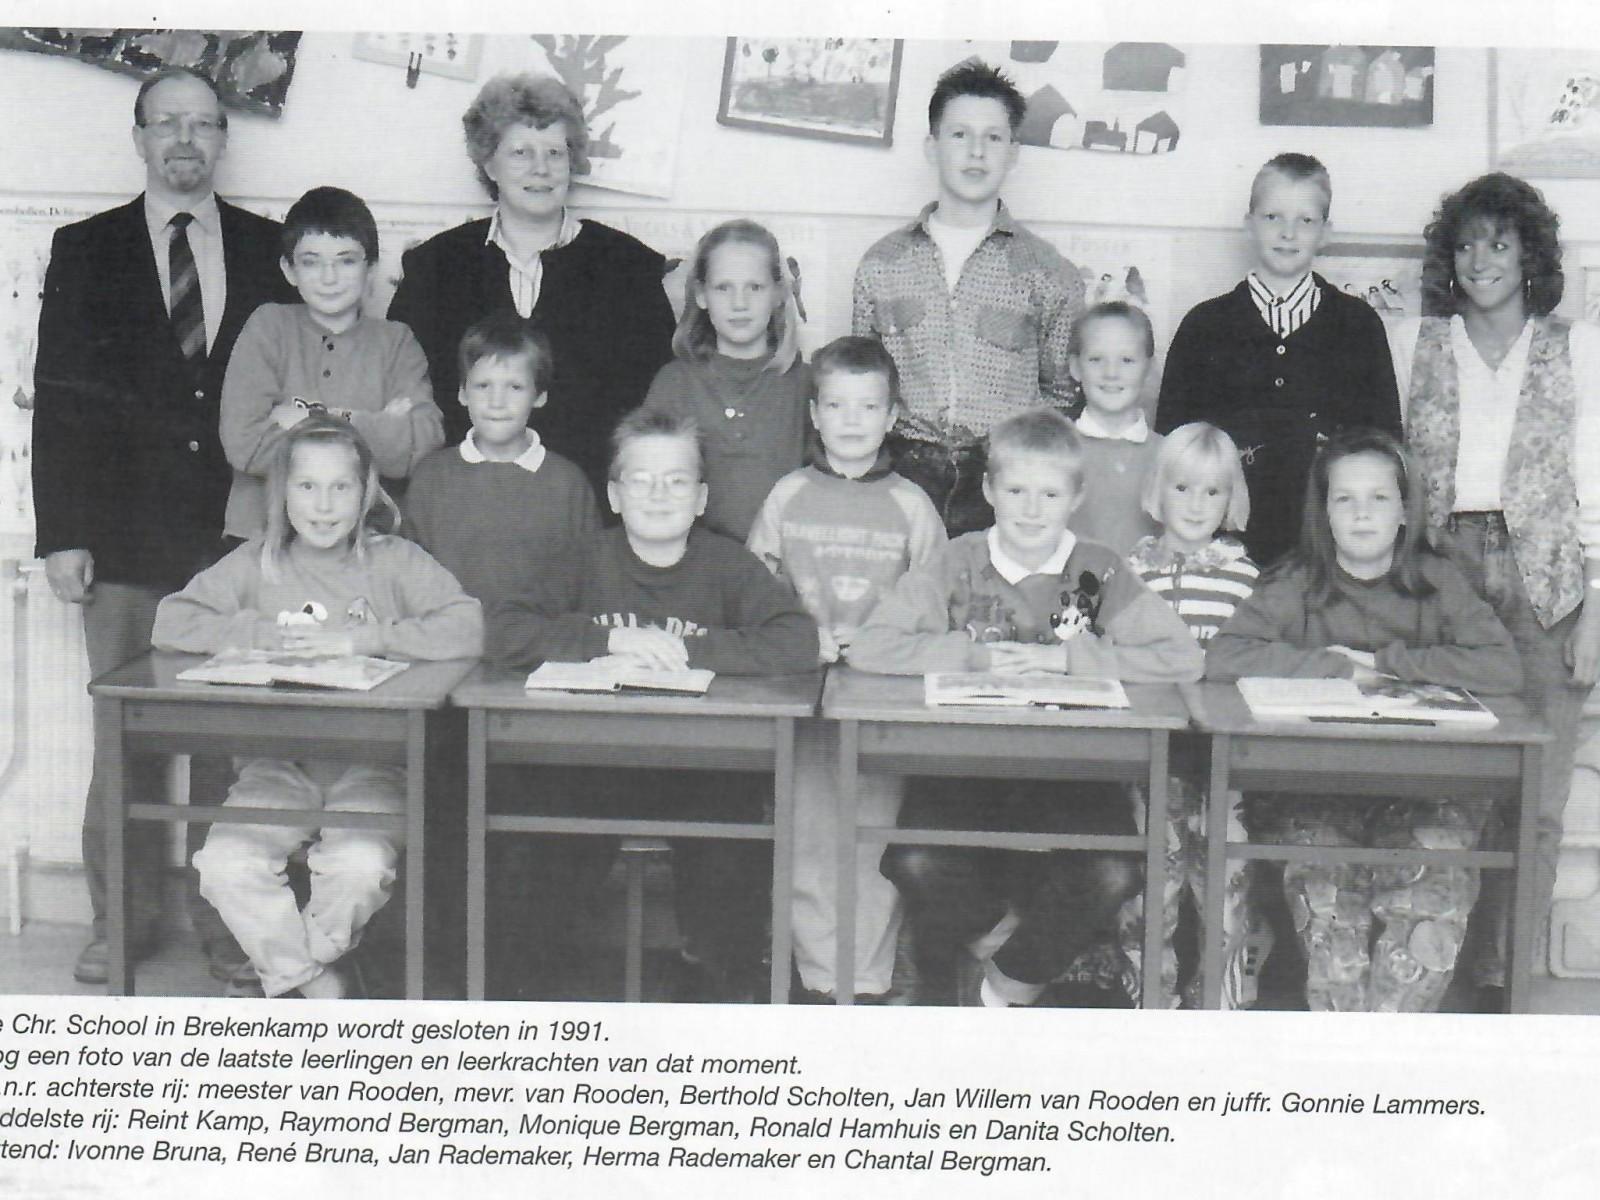 Laatste foto school Breklenkamp 1991